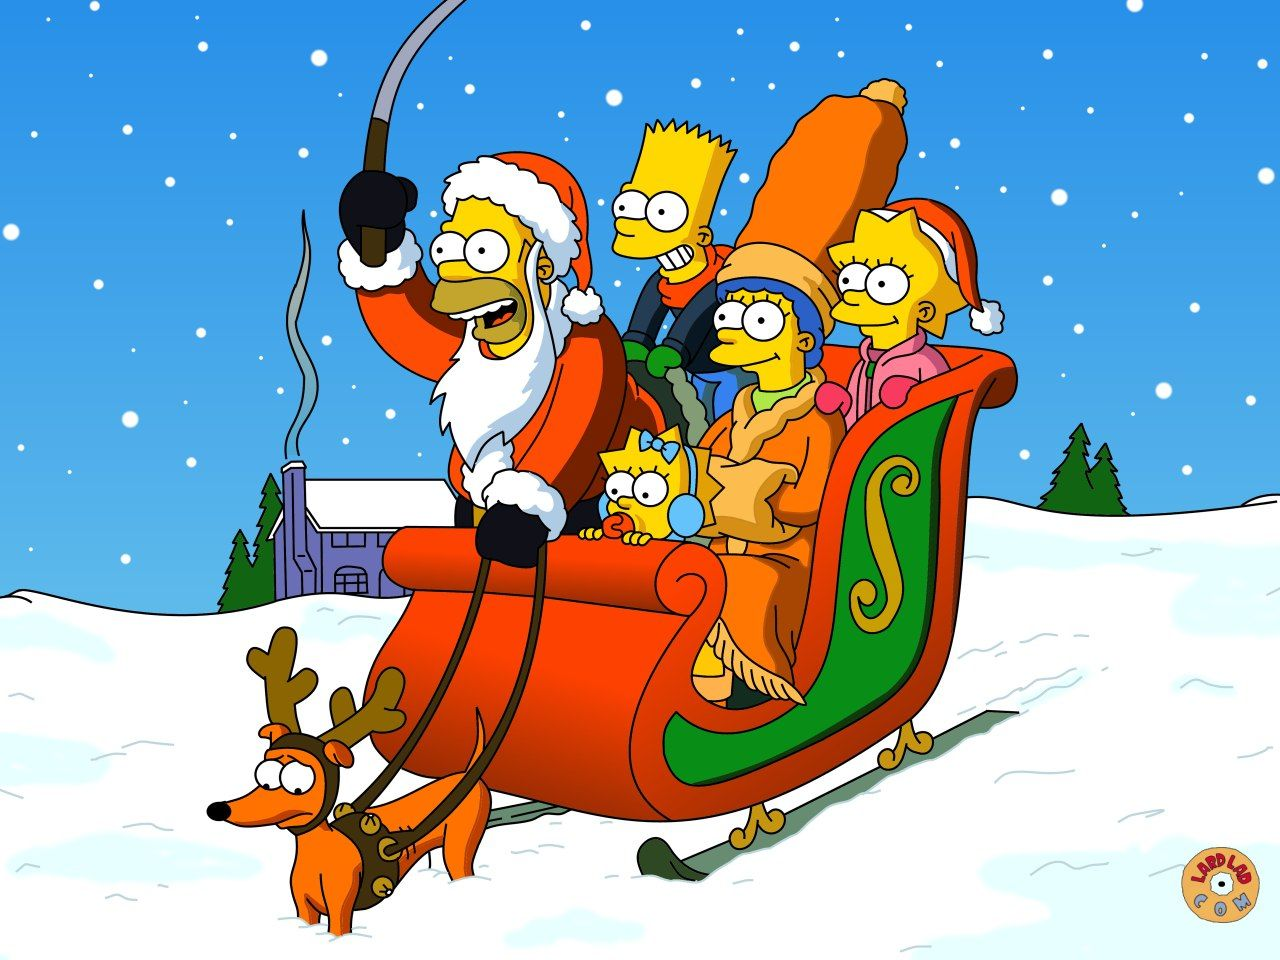 Tumblr Fondos De Pantalla De Navidad: Fondos De Pantalla De Navidad De Los Simpson Para Pantalla